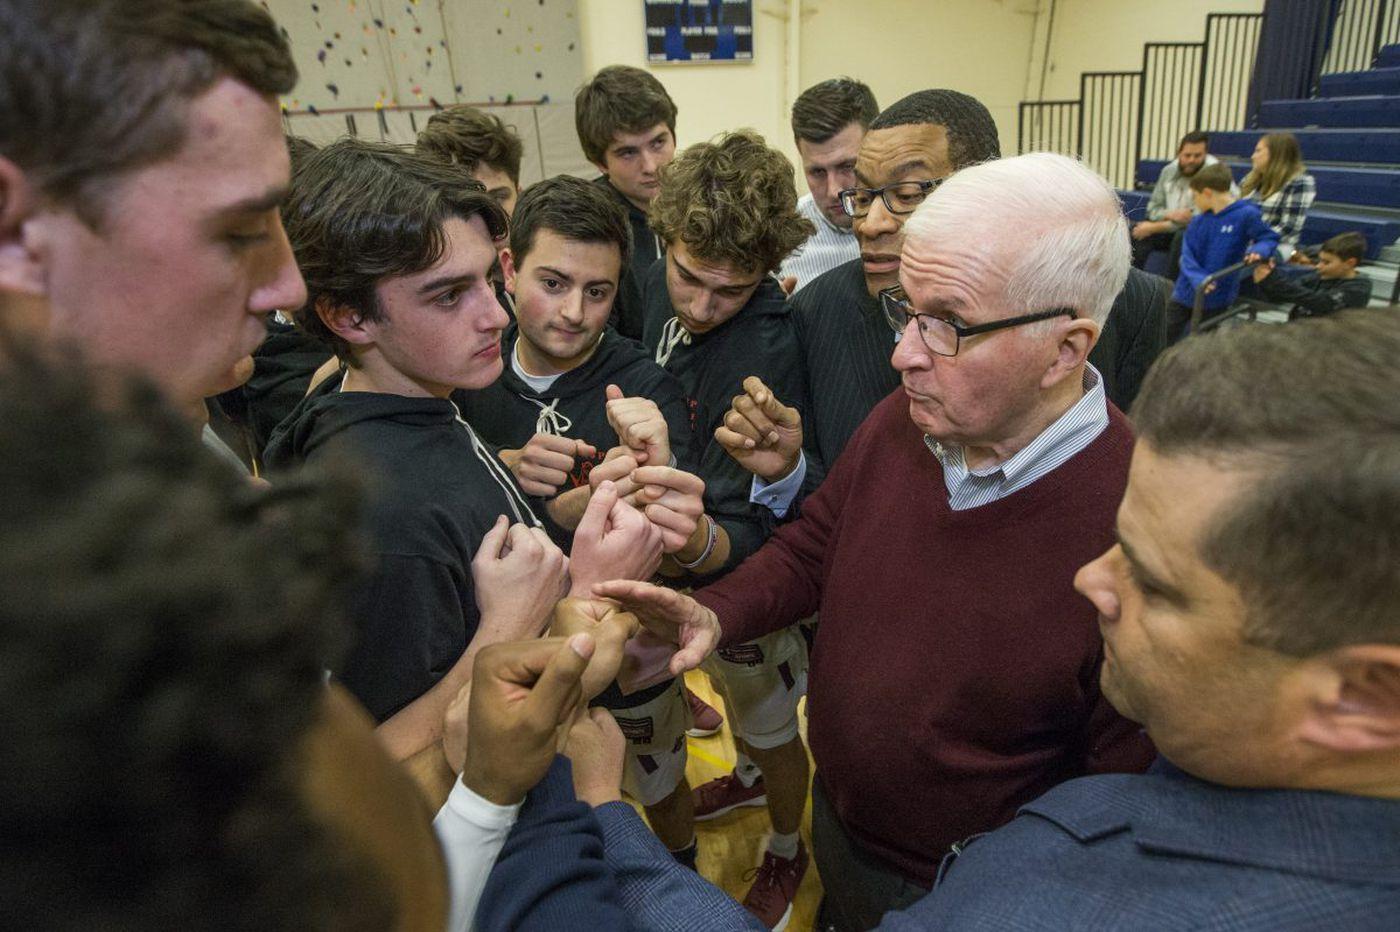 Sunday's Pa. roundup: St. Joseph's Prep's Speedy Morris inches closer to 1,000 career wins